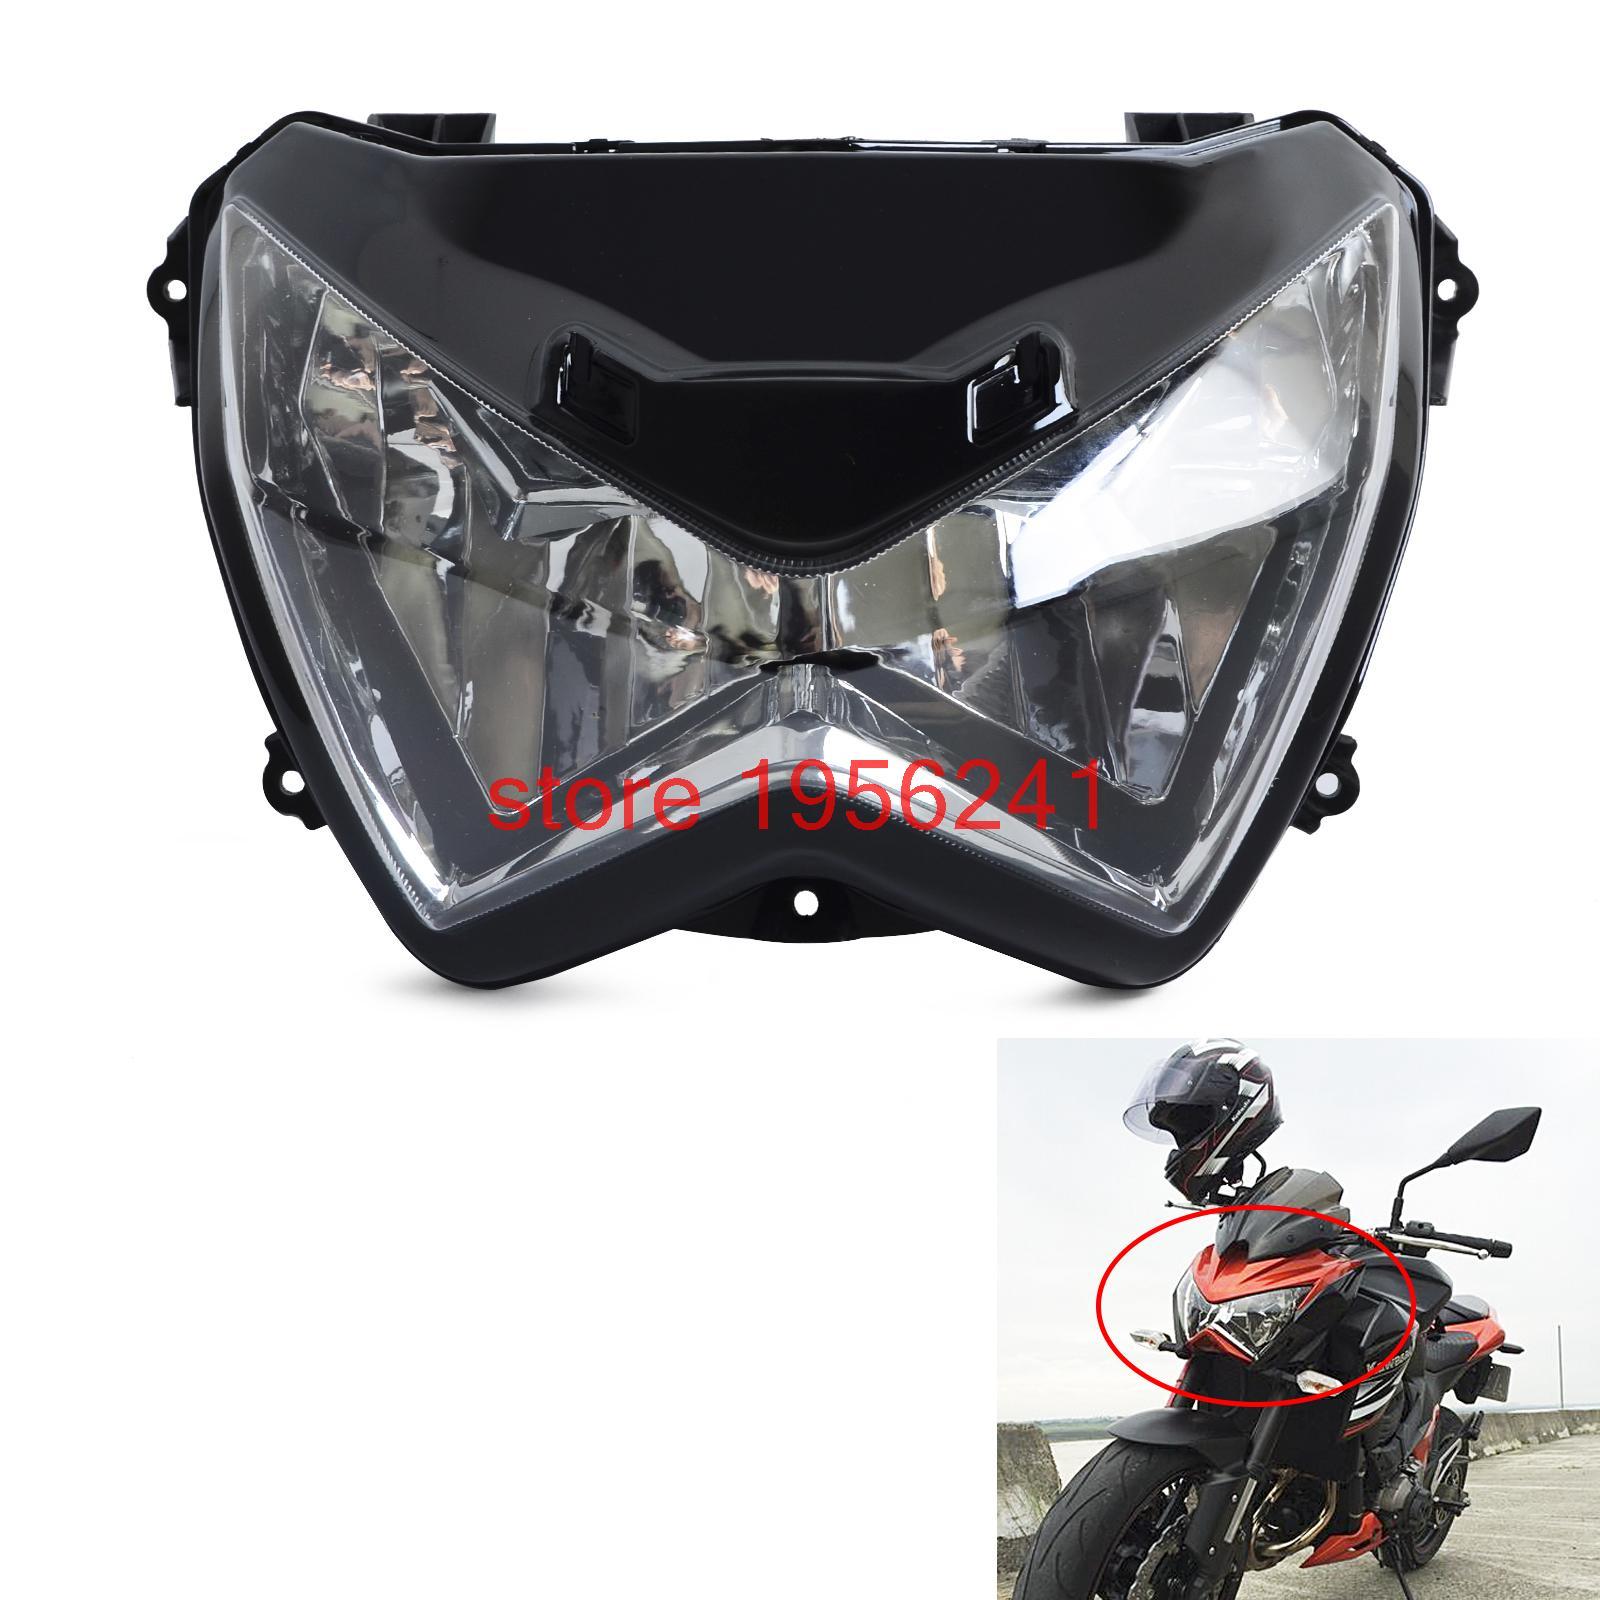 Новый Ясно фара передних свет лампы для Kawasaki z250 Z800 2013 2014 2015 2016 z300 2015 2016 Новый